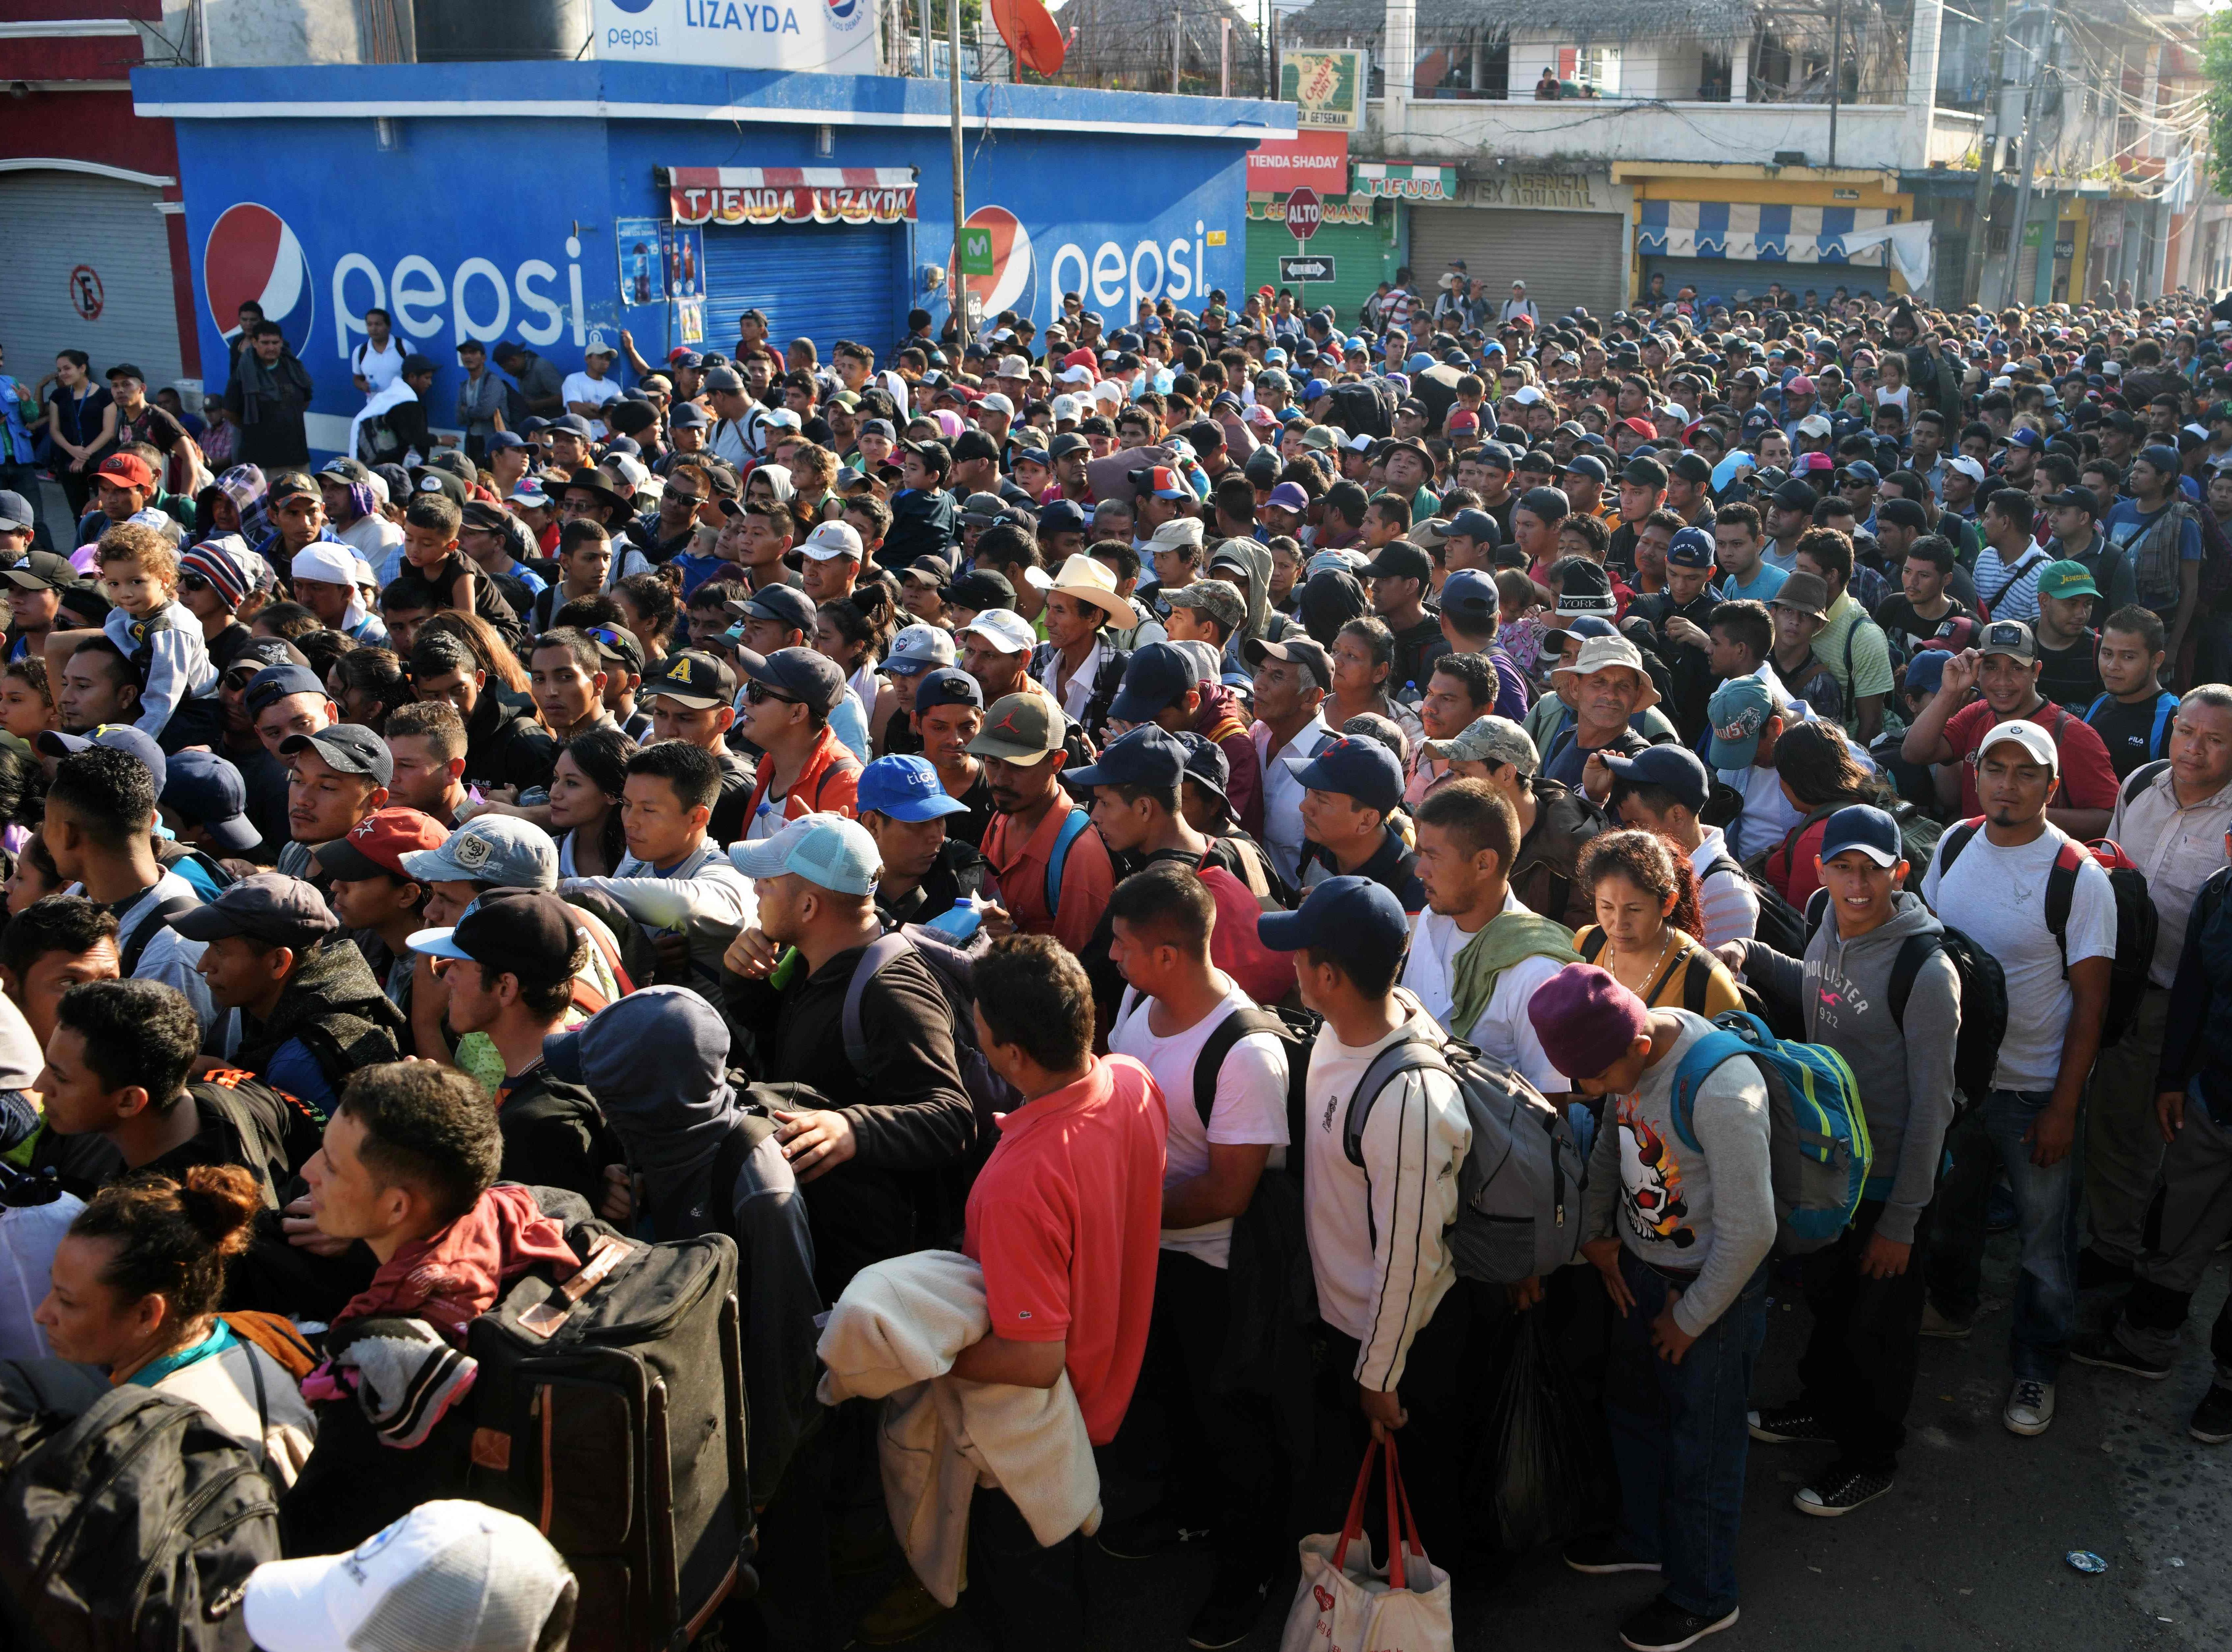 Salvadorian migrants wait to enter the Guatemala-Mexico international border bridge next to the customs building in Ciudad Tecun Uman, Guatemala, on Nov. 2, 2018.